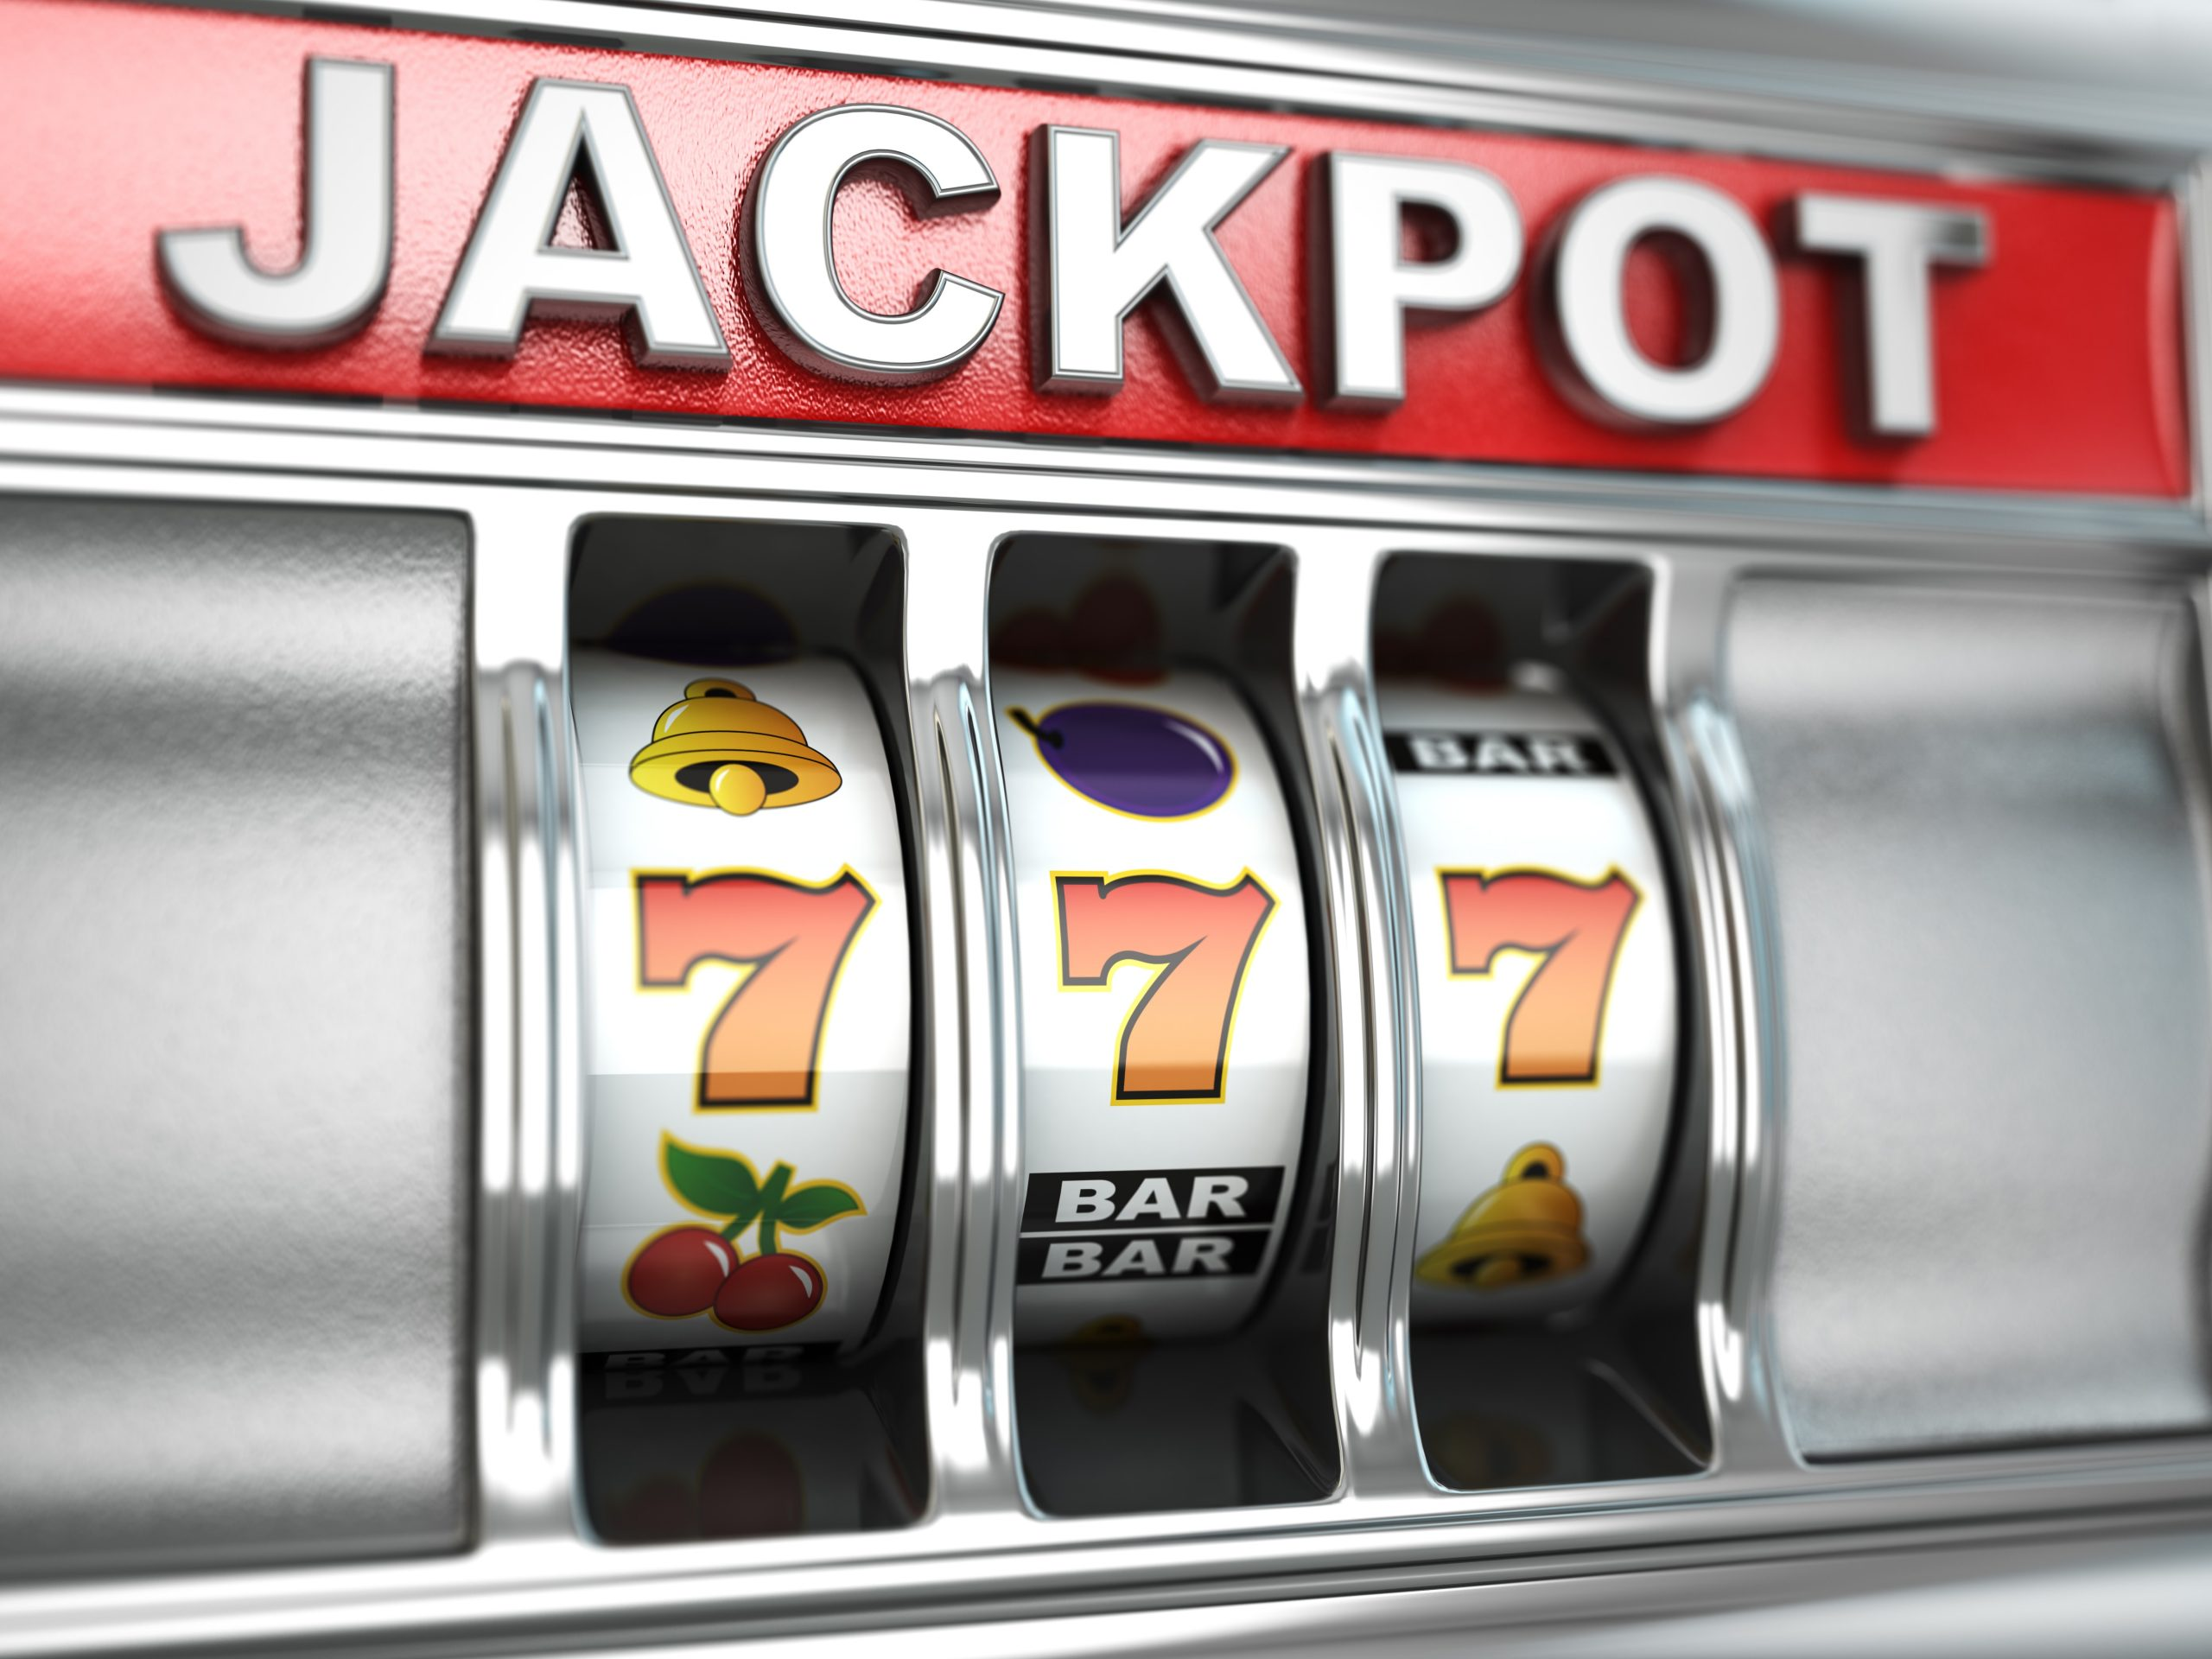 Spilleautomat med jackpot